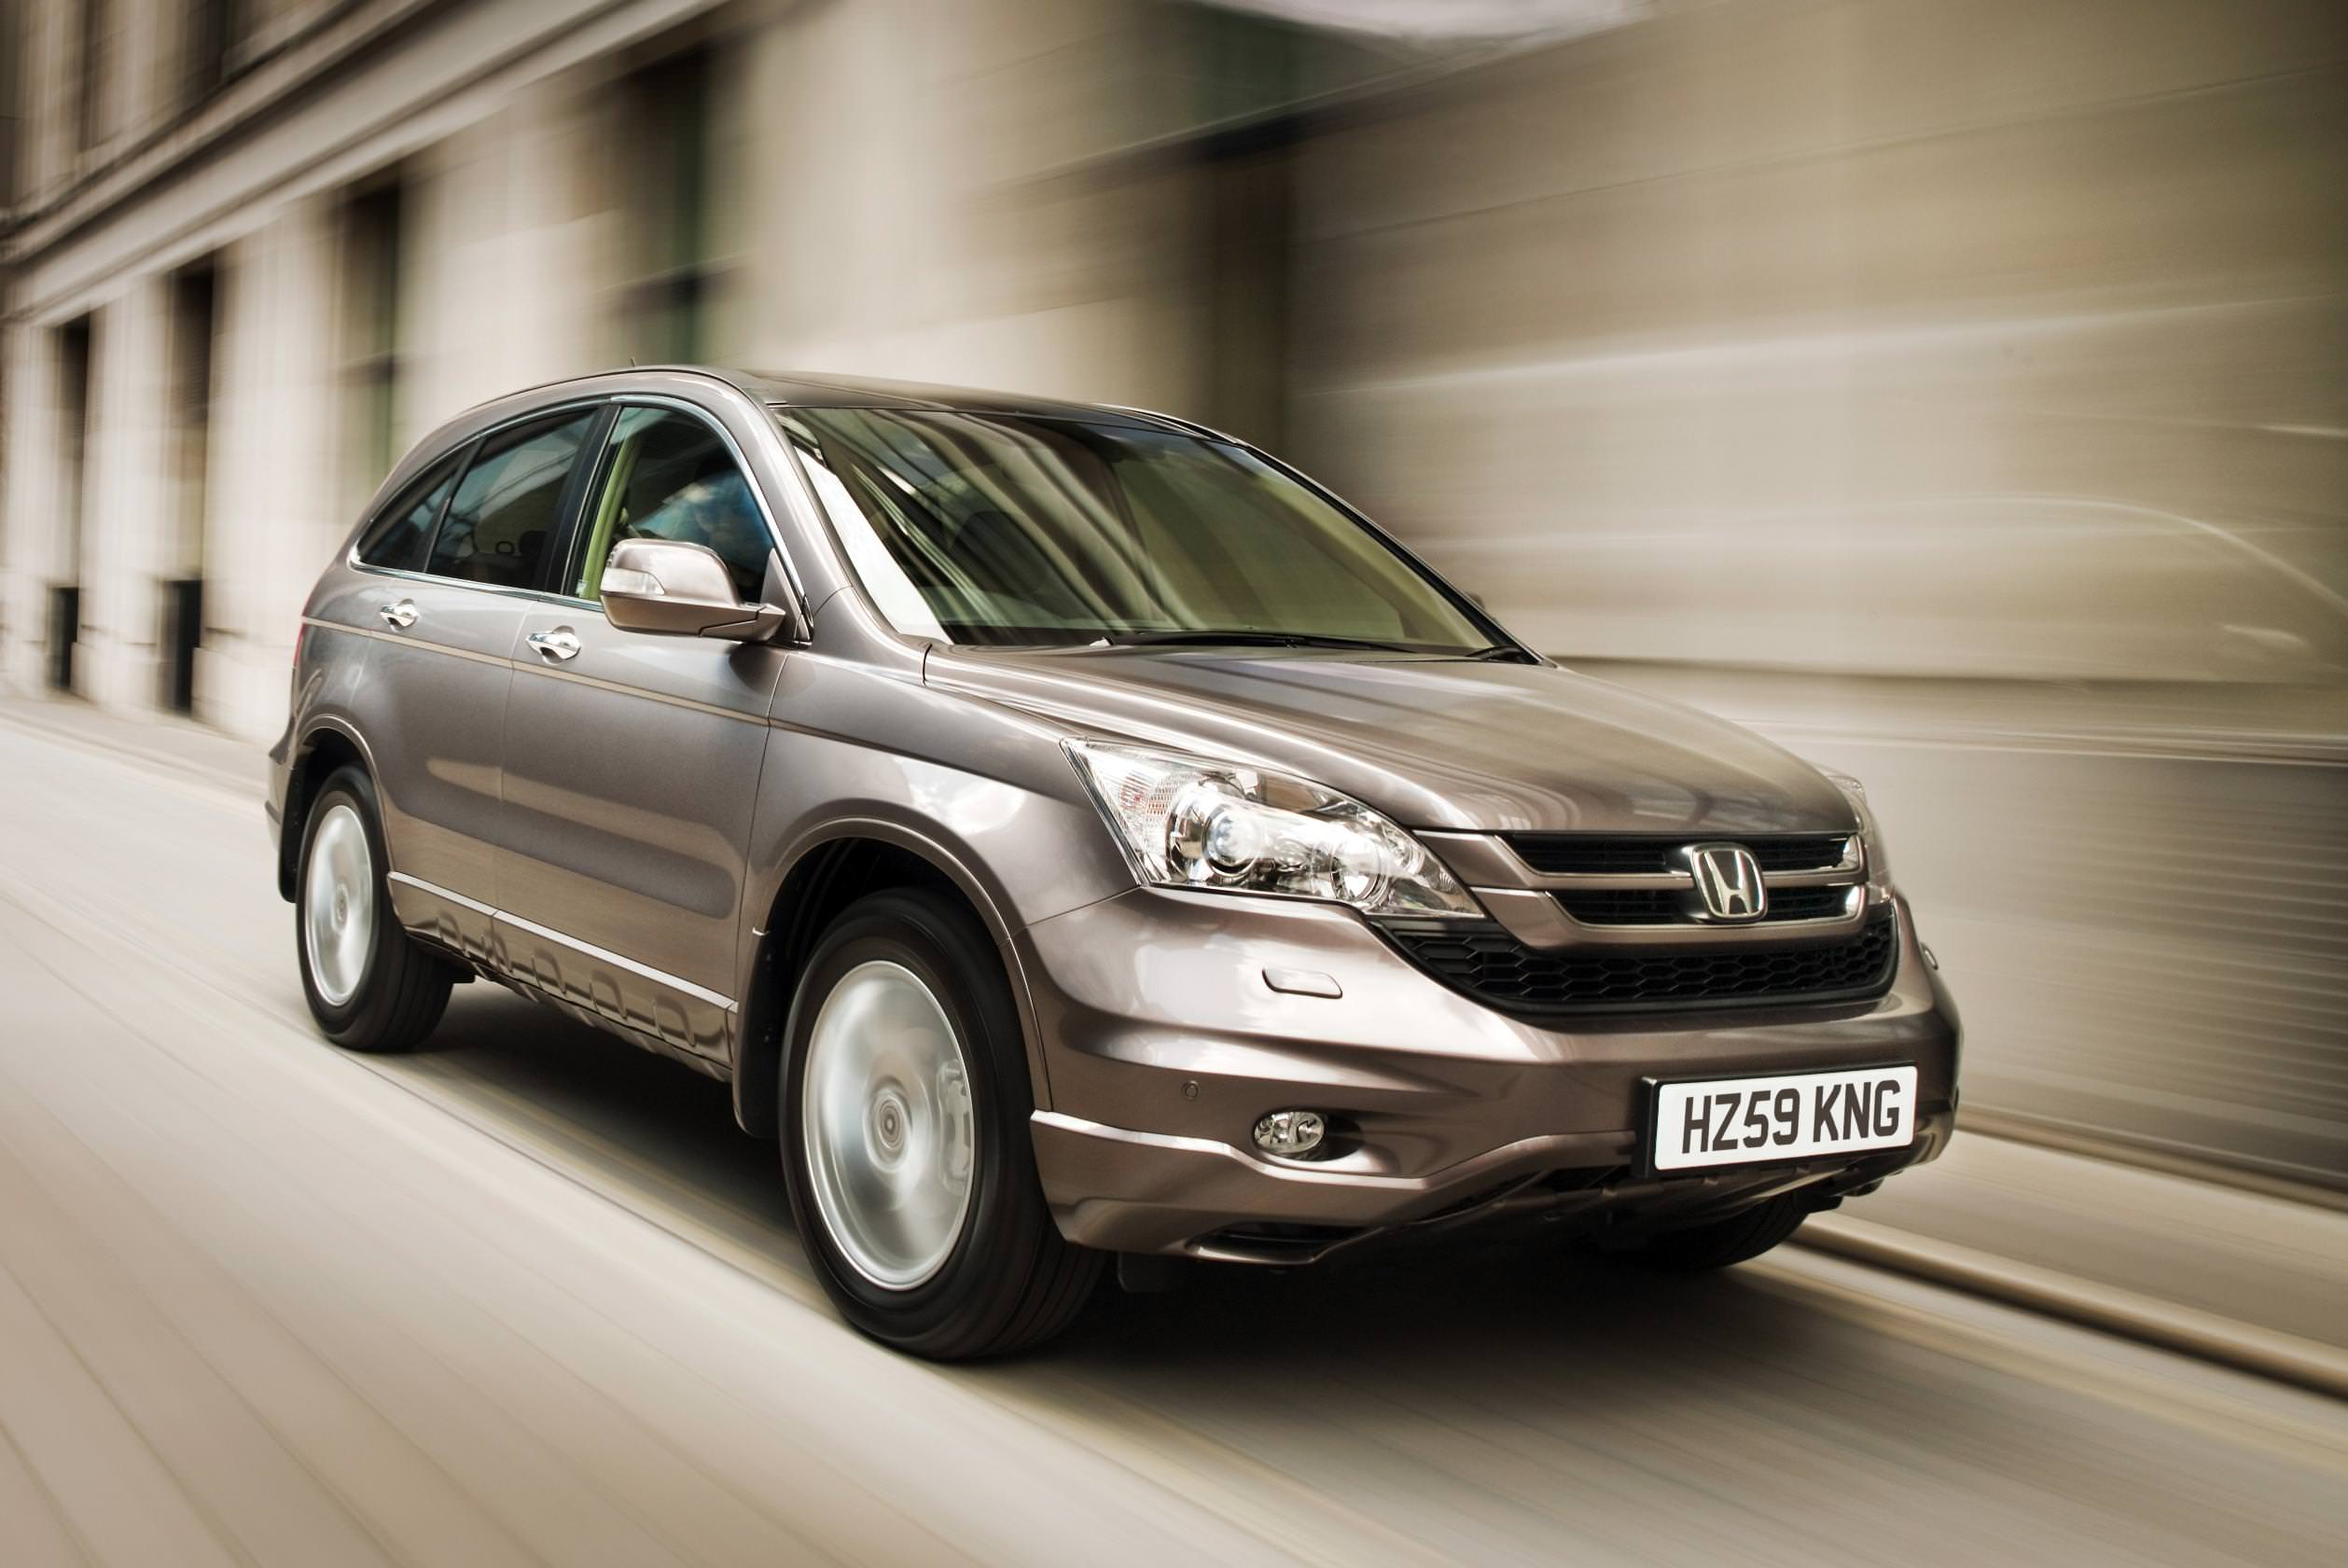 One of the best used family cars for £600 - Honda CR-V